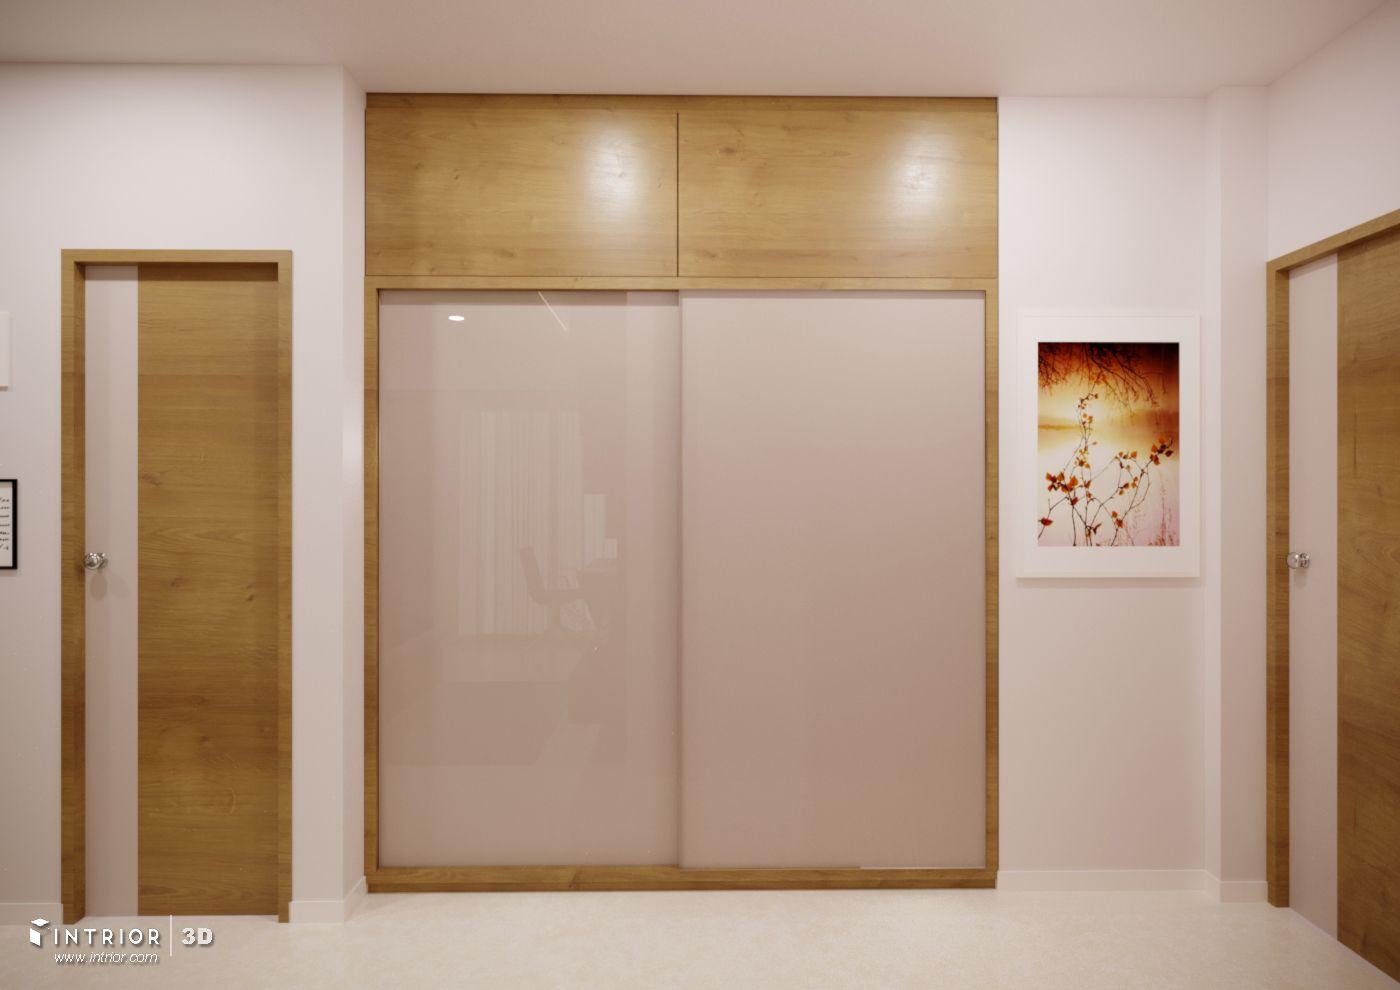 Sliding Wardrobe In Acrylic Shutters Living Room Partition Design Interior Room Decoration Bed Furniture Design